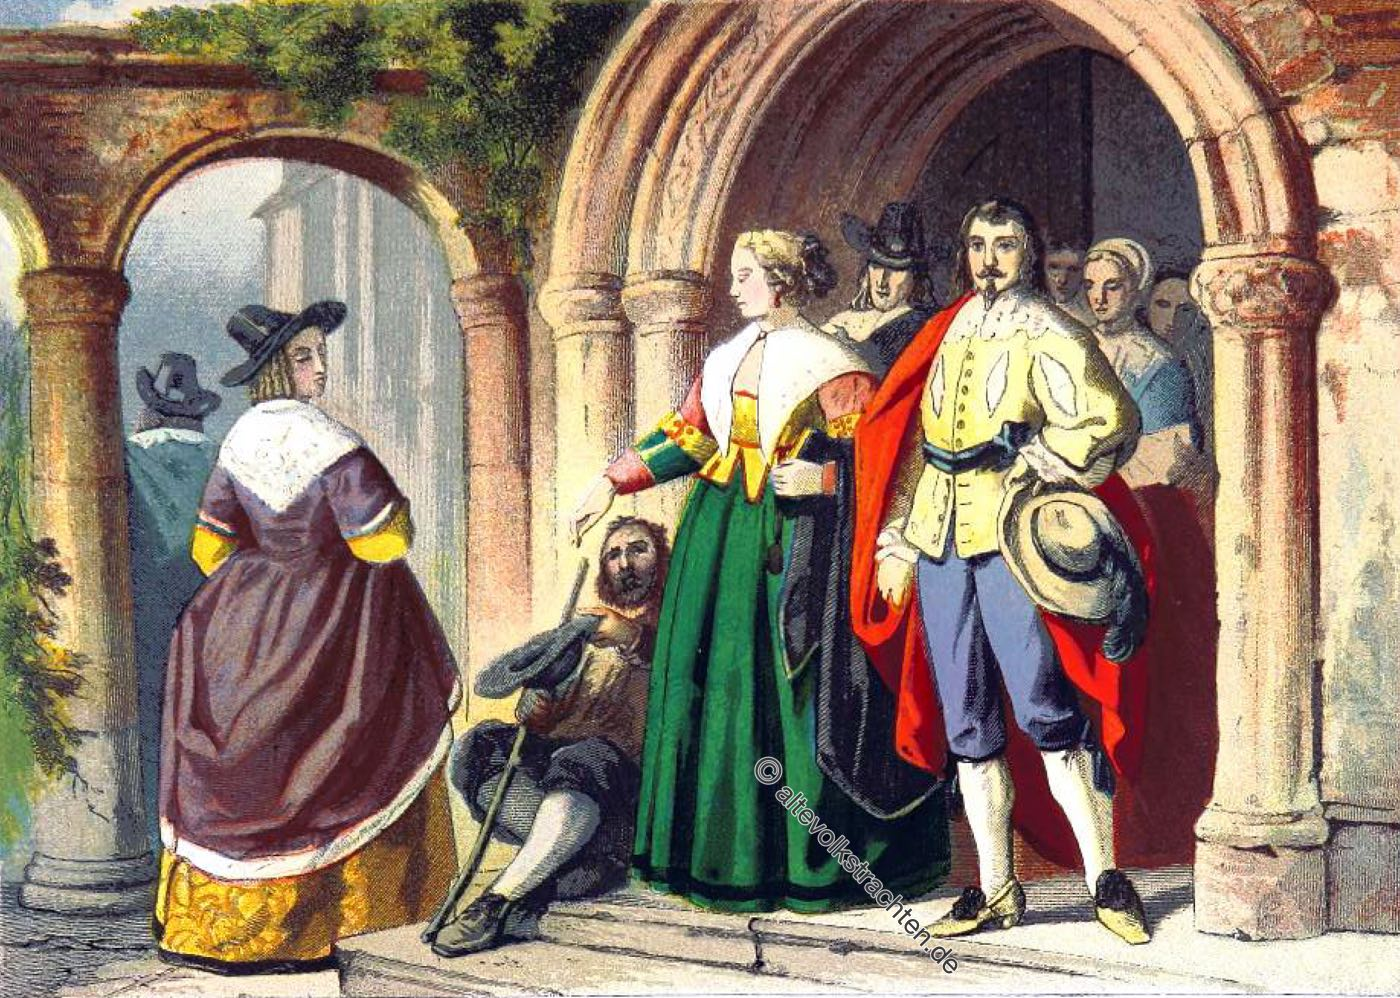 England, Kostüme, Englische Modepoche, Stuart, Stuarts, Karl I, Barock,